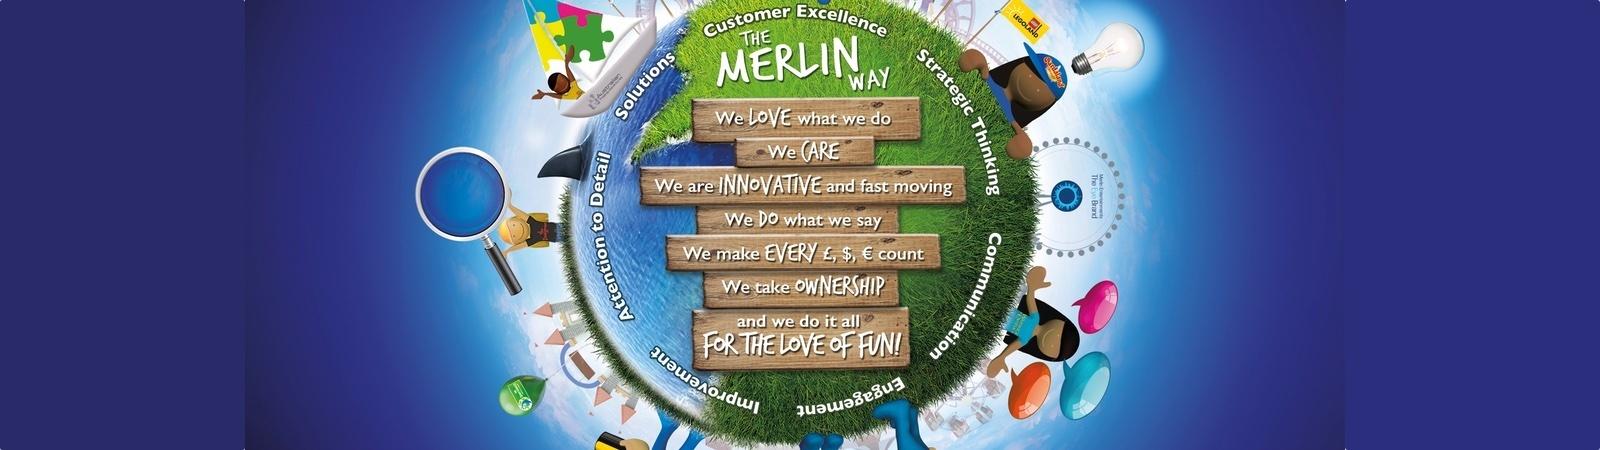 The Merlin Way - Values for Merlin Entertainment.jpg